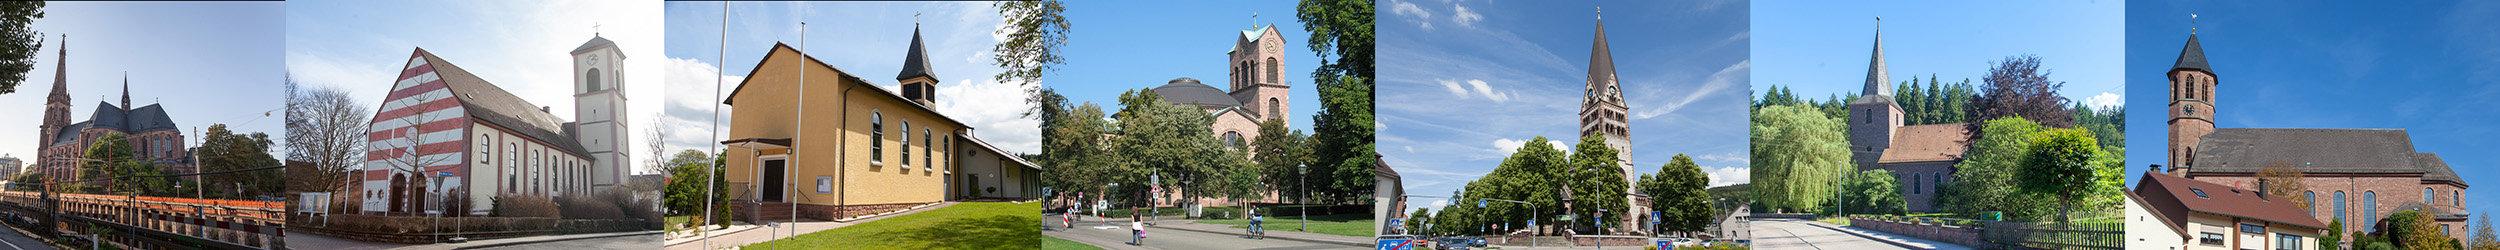 Zero Karlsruhe